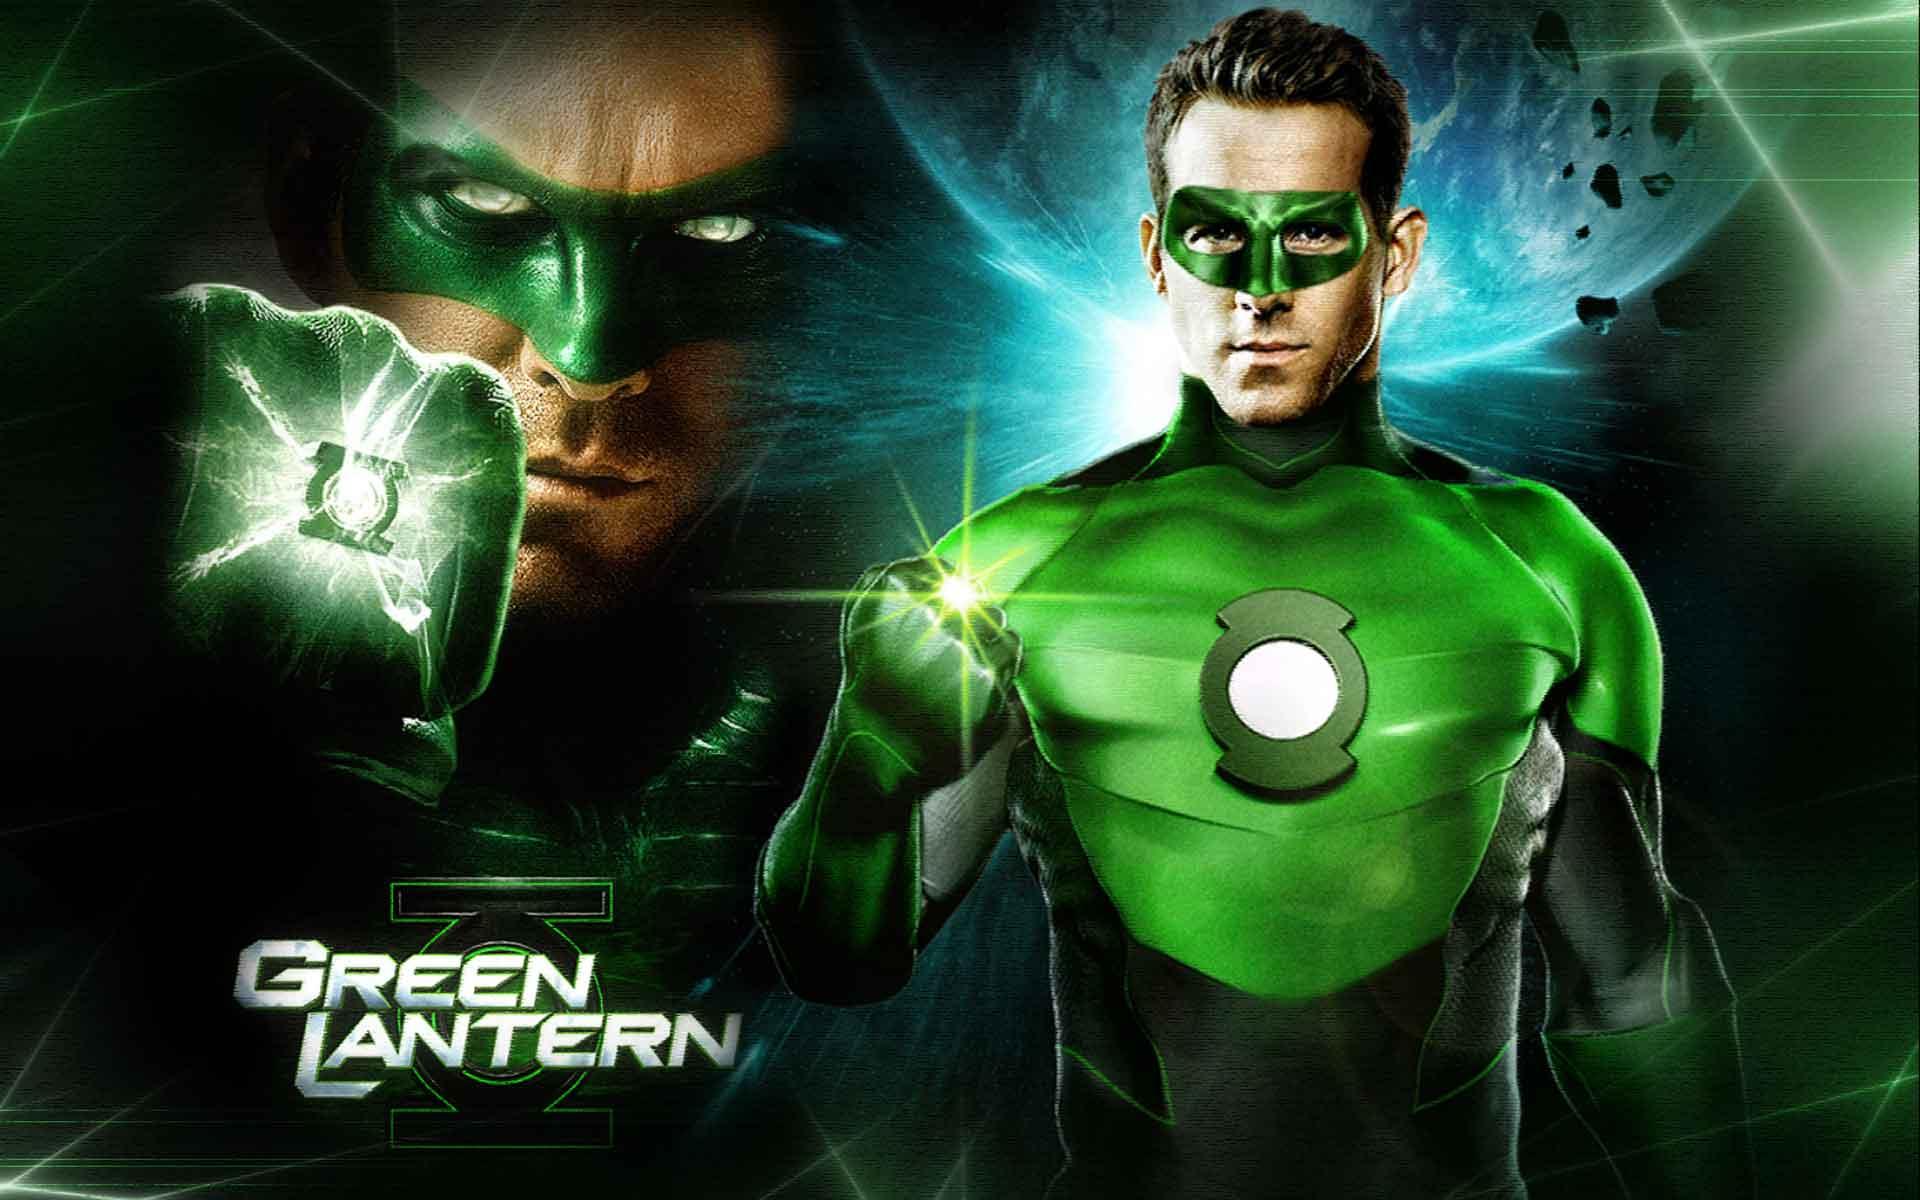 download 8589130504006 green lantern movie wallpaper hdjpg 1920x1200